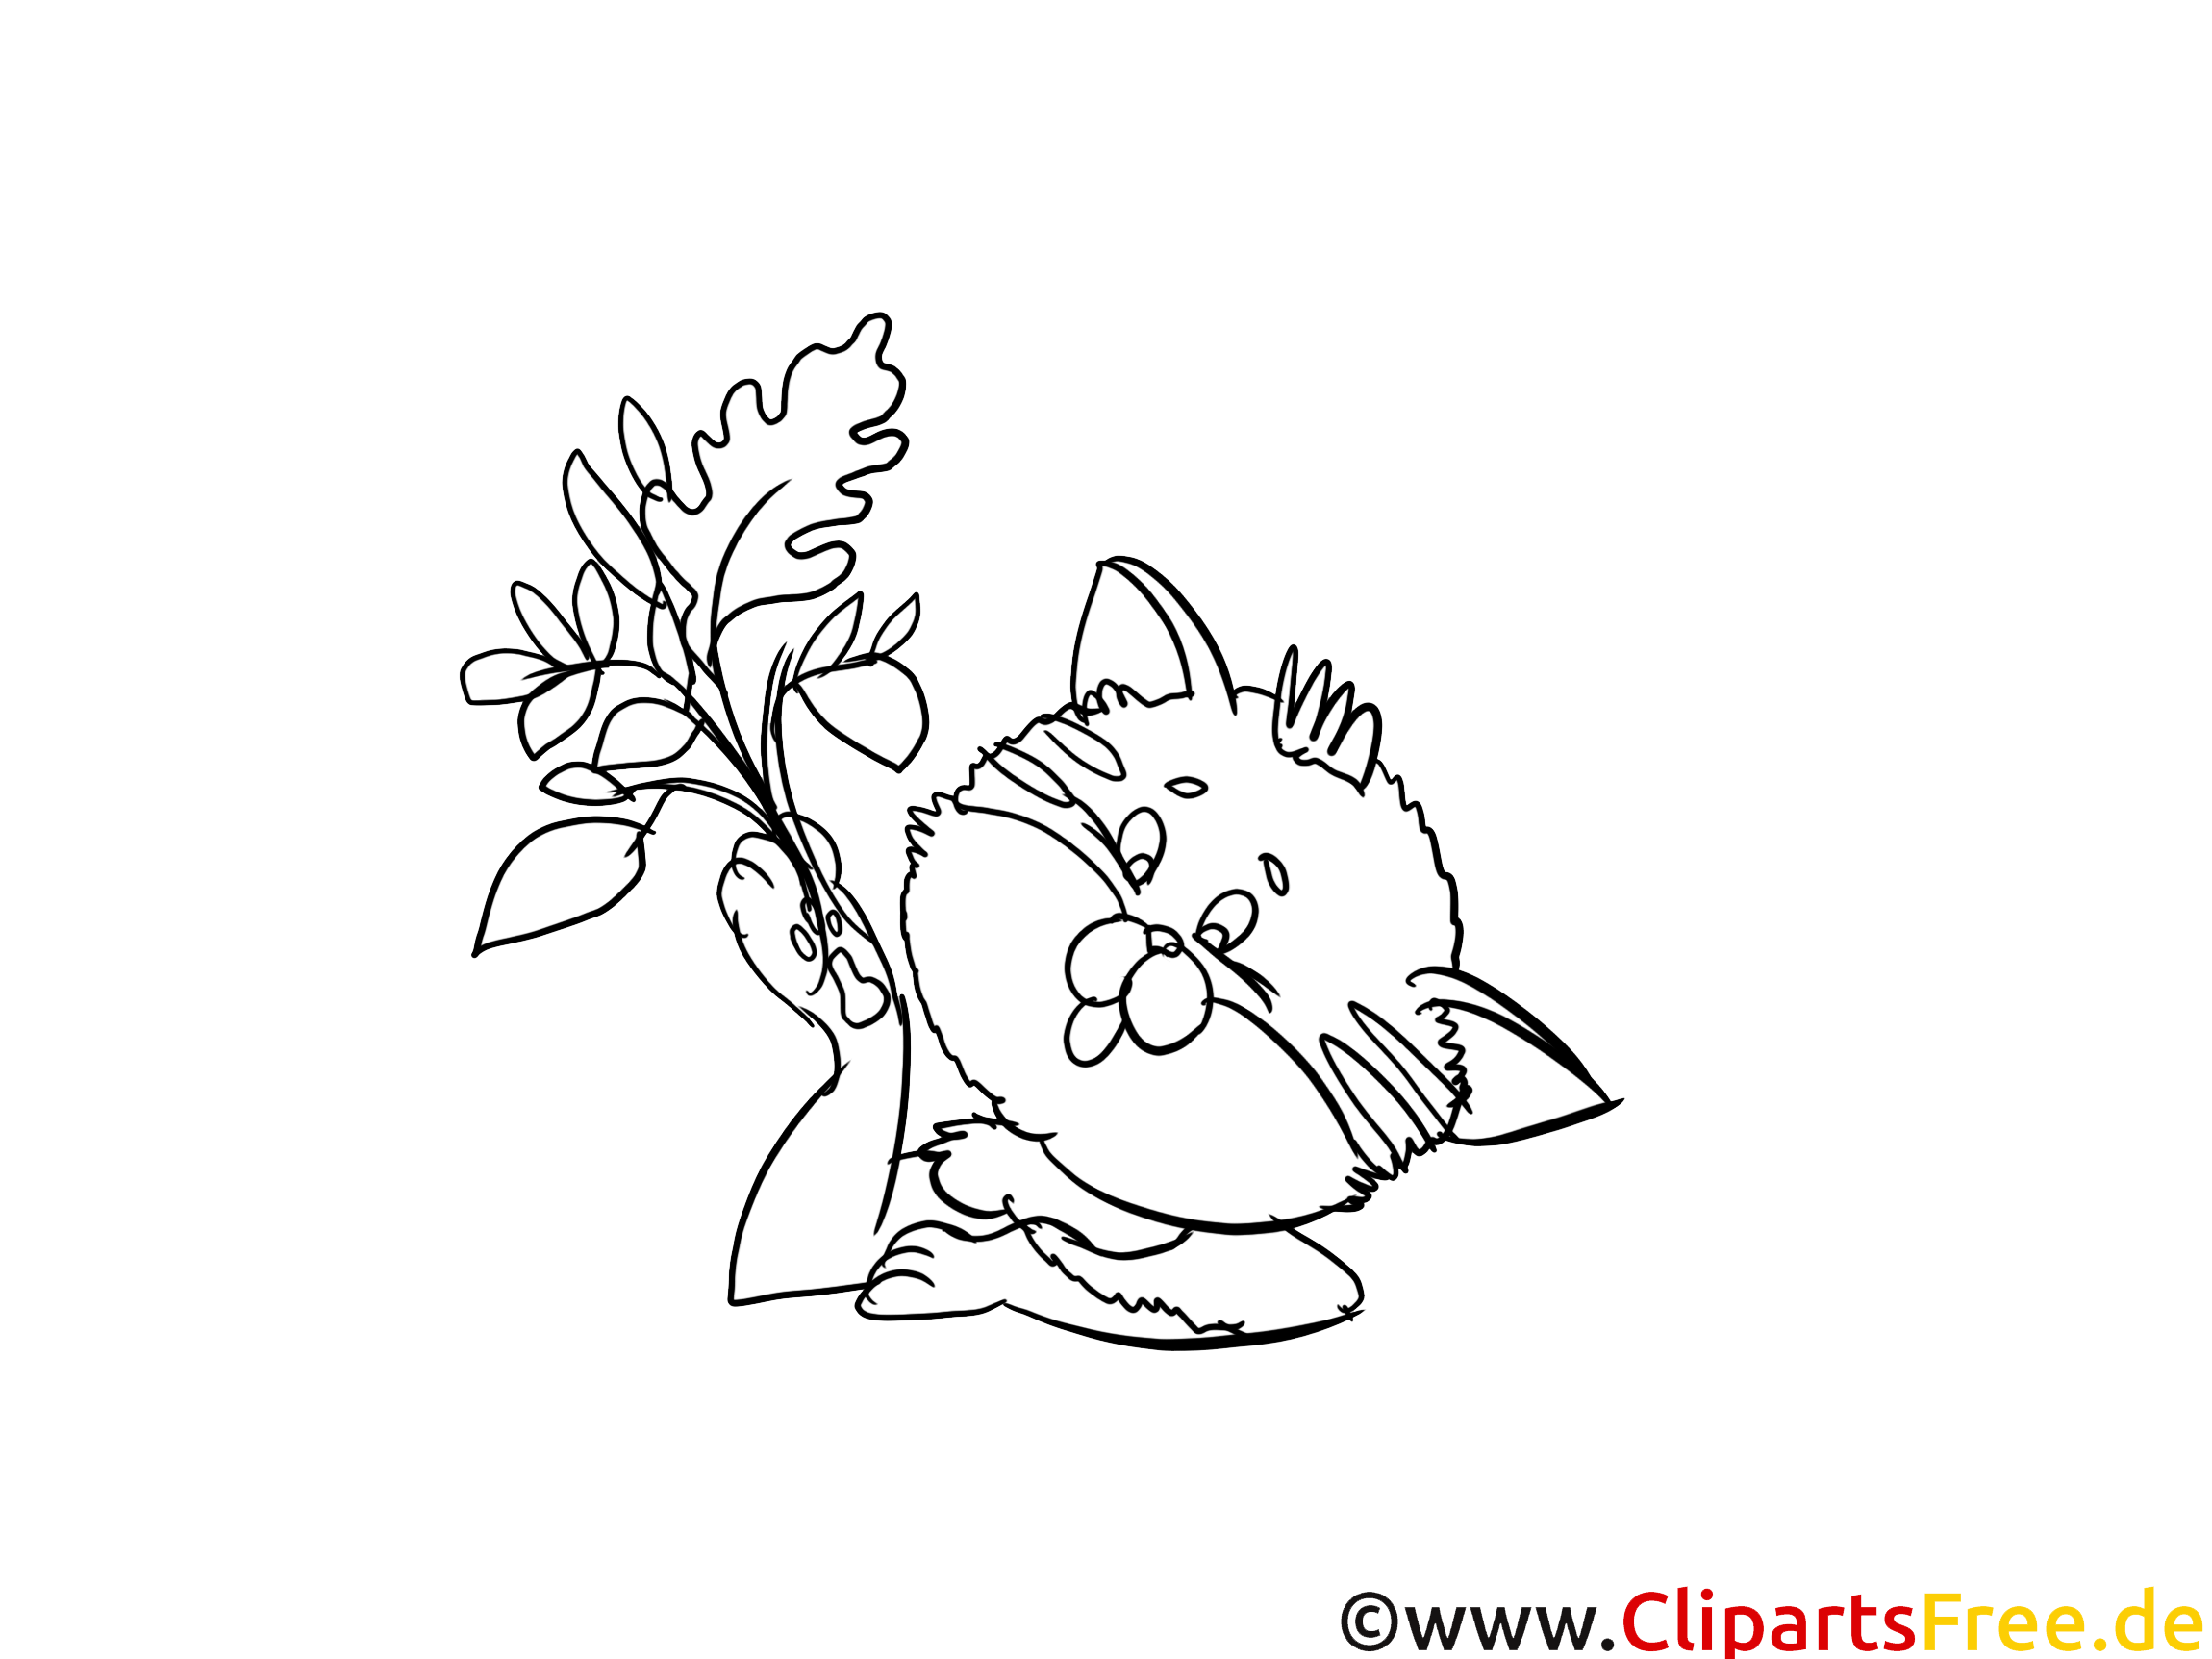 Cartoon Katze Ausmalbild - Kostenlose Ausmalbilder Herbst